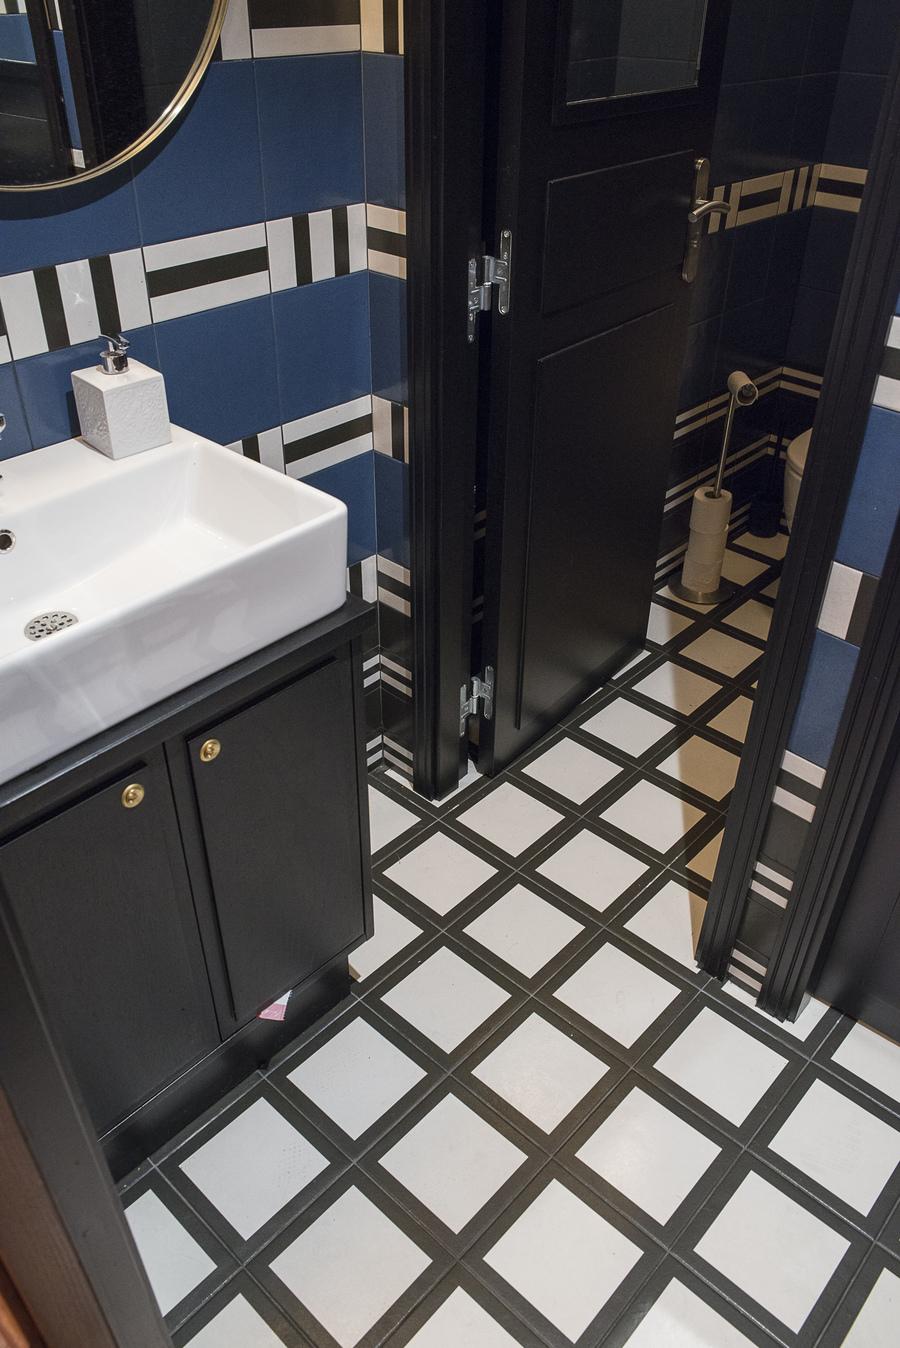 STUDIO-EMMA-ROUX-ANTHONY-COTTAREL-RESTAURANT-HOTEL-COMPTOIR